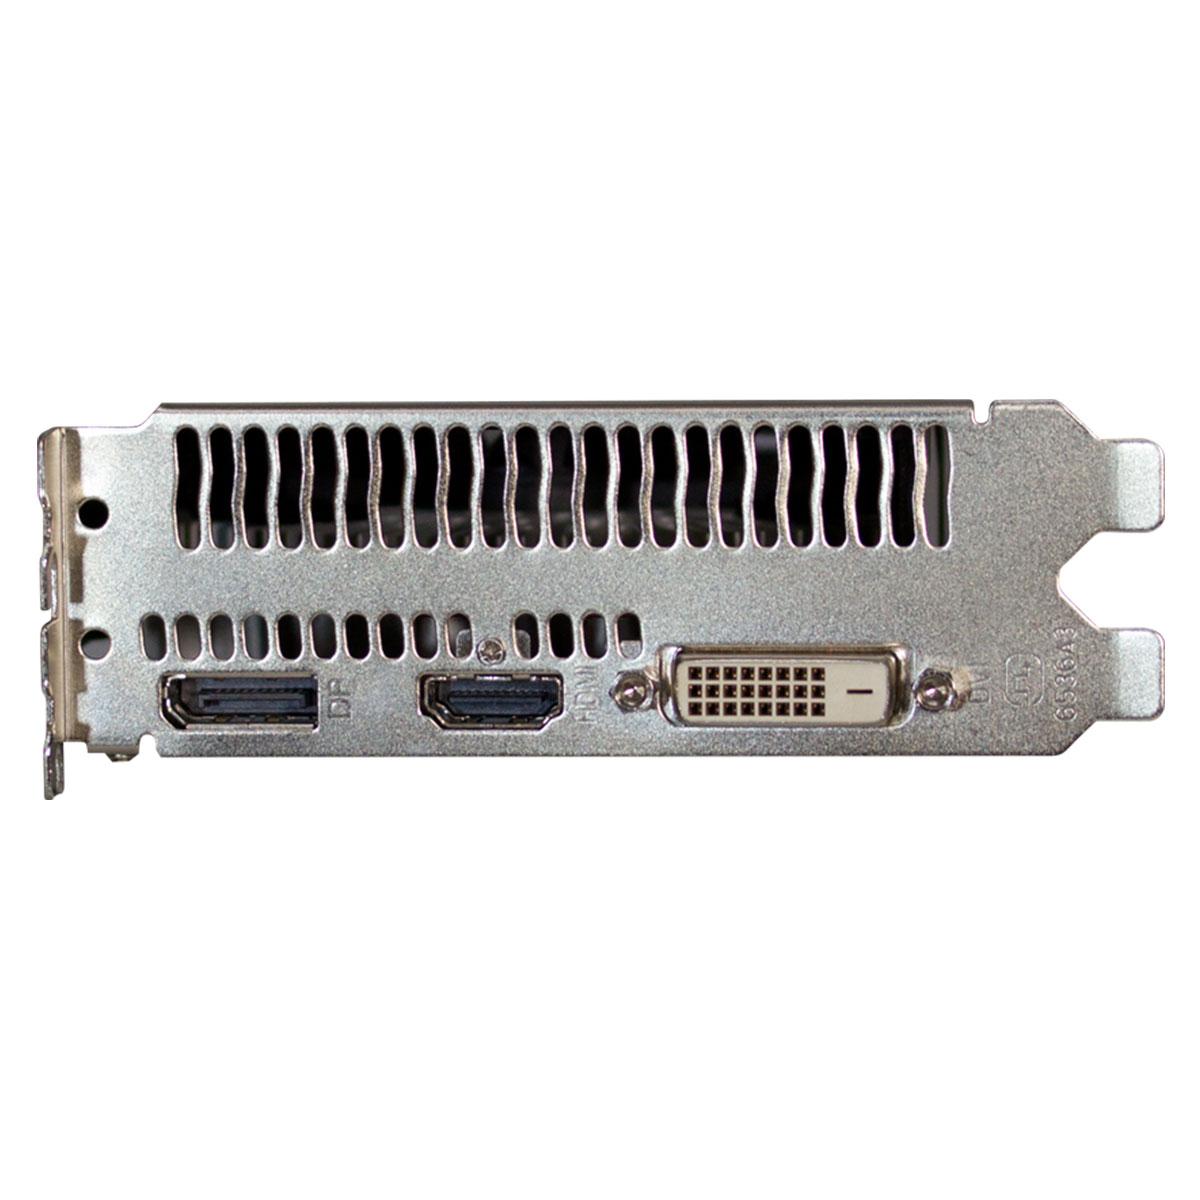 Placa de Vídeo PowerColor Red Dragon Radeon RX 550, 4GB, DDR5, 128 Bits - AXRX 550 4GBD5-DHV6